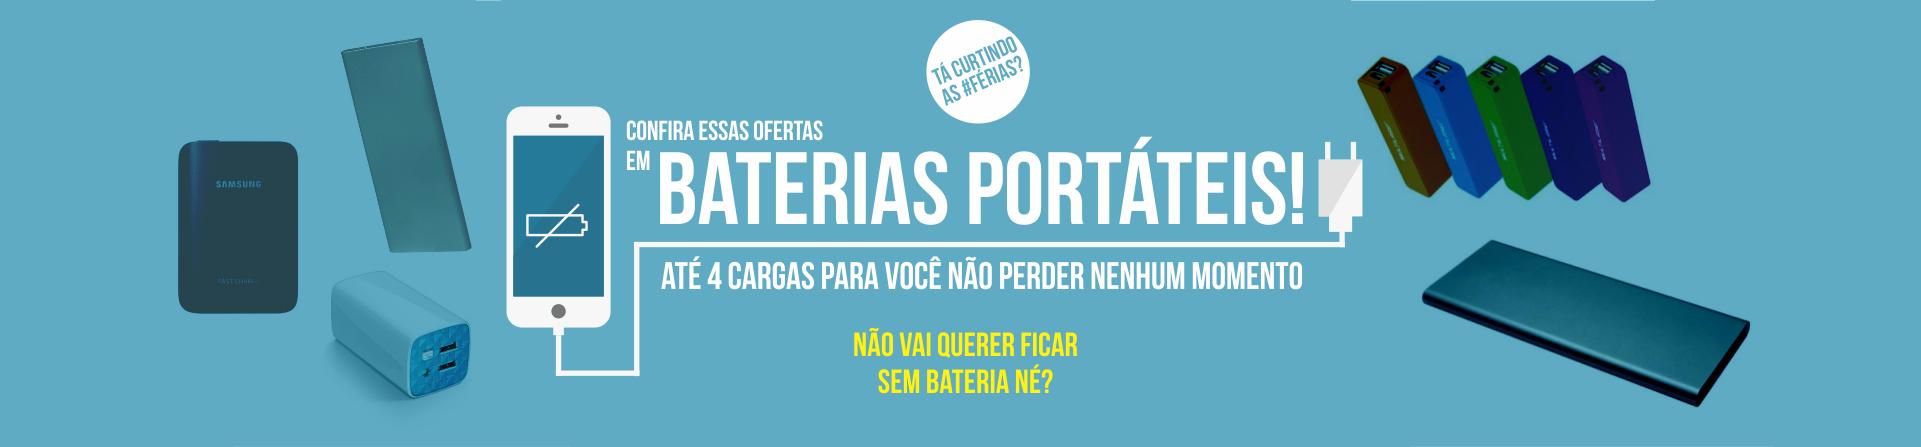 BANNER FERIAS BATERIA PORT